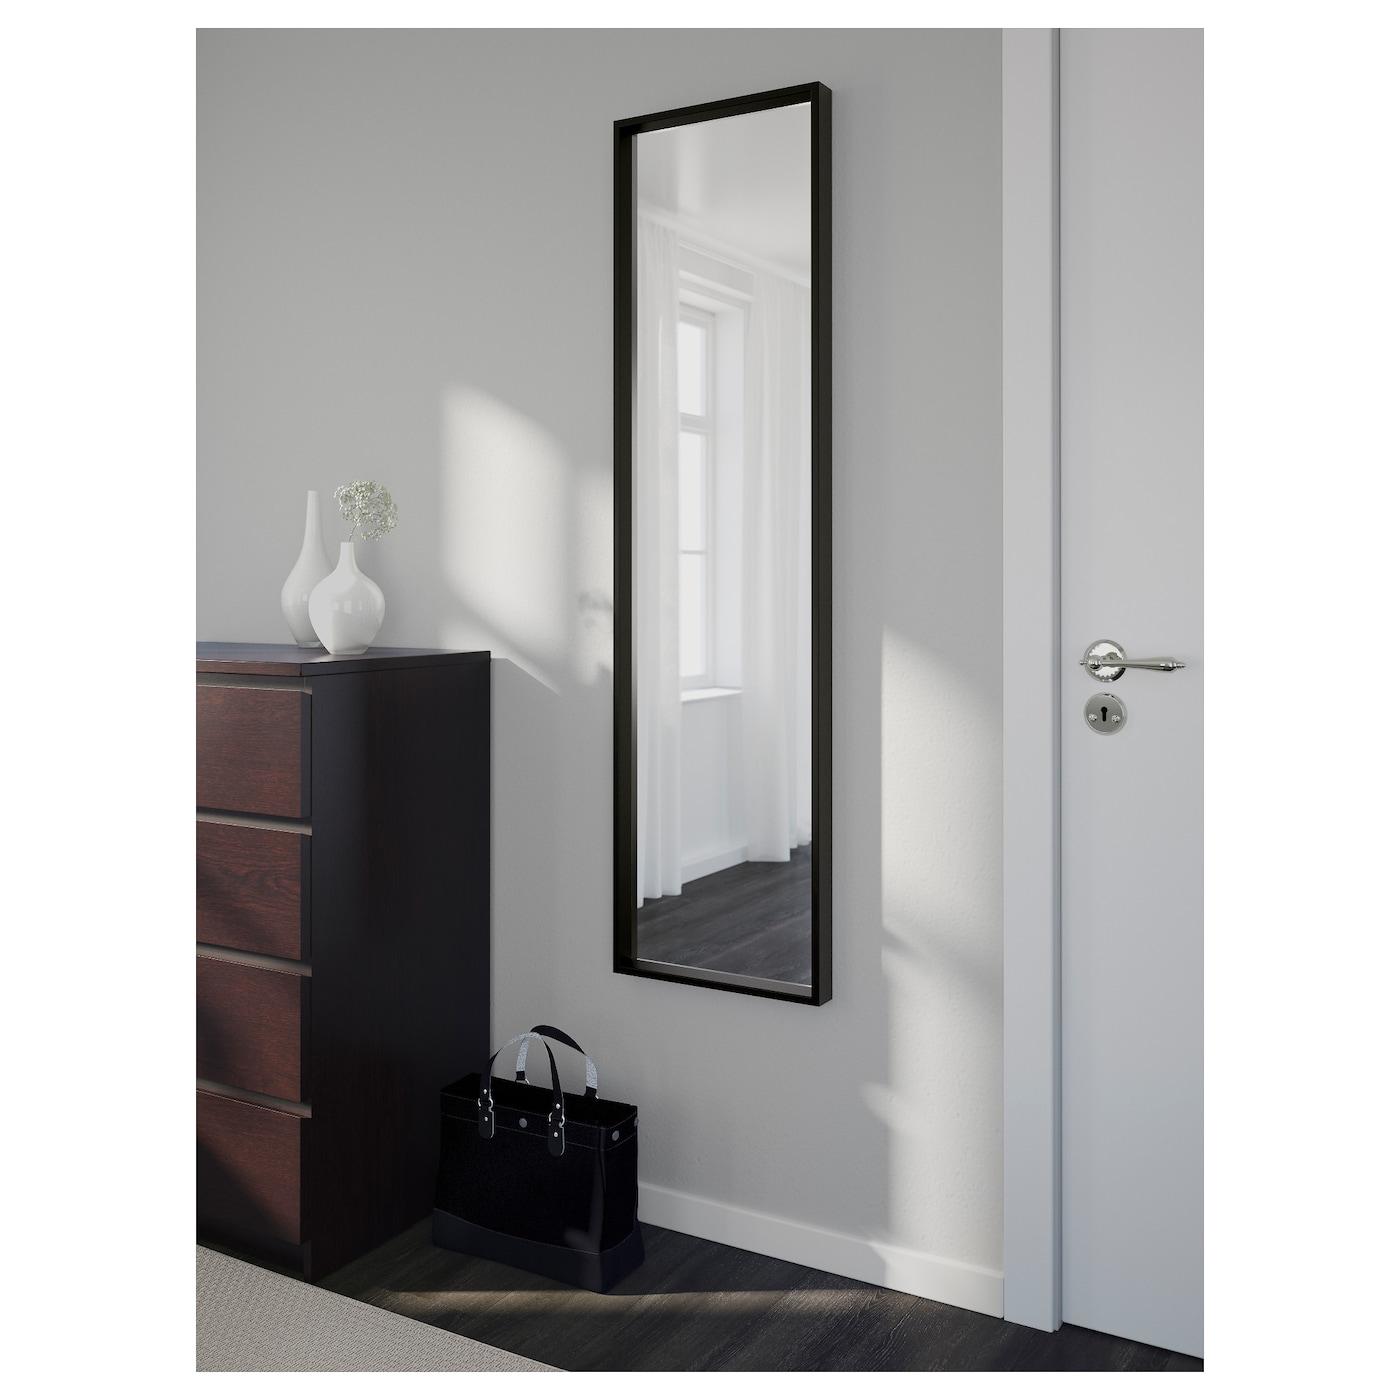 nissedal miroir noir 40x150 cm ikea. Black Bedroom Furniture Sets. Home Design Ideas